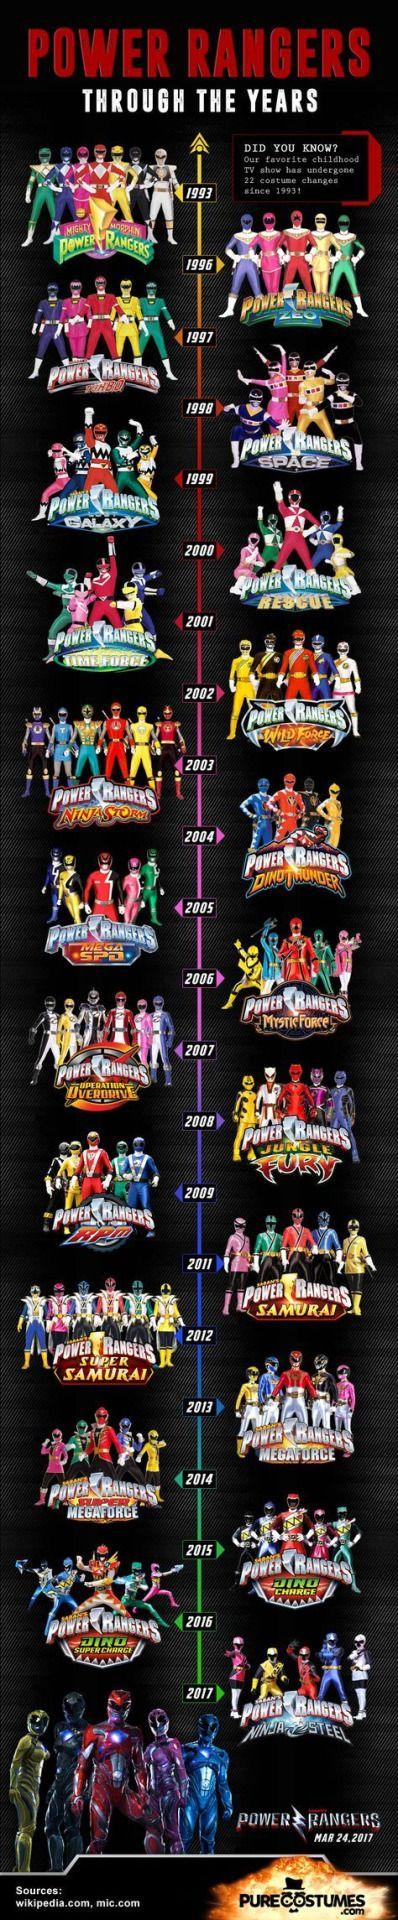 Power Rangers Timeline